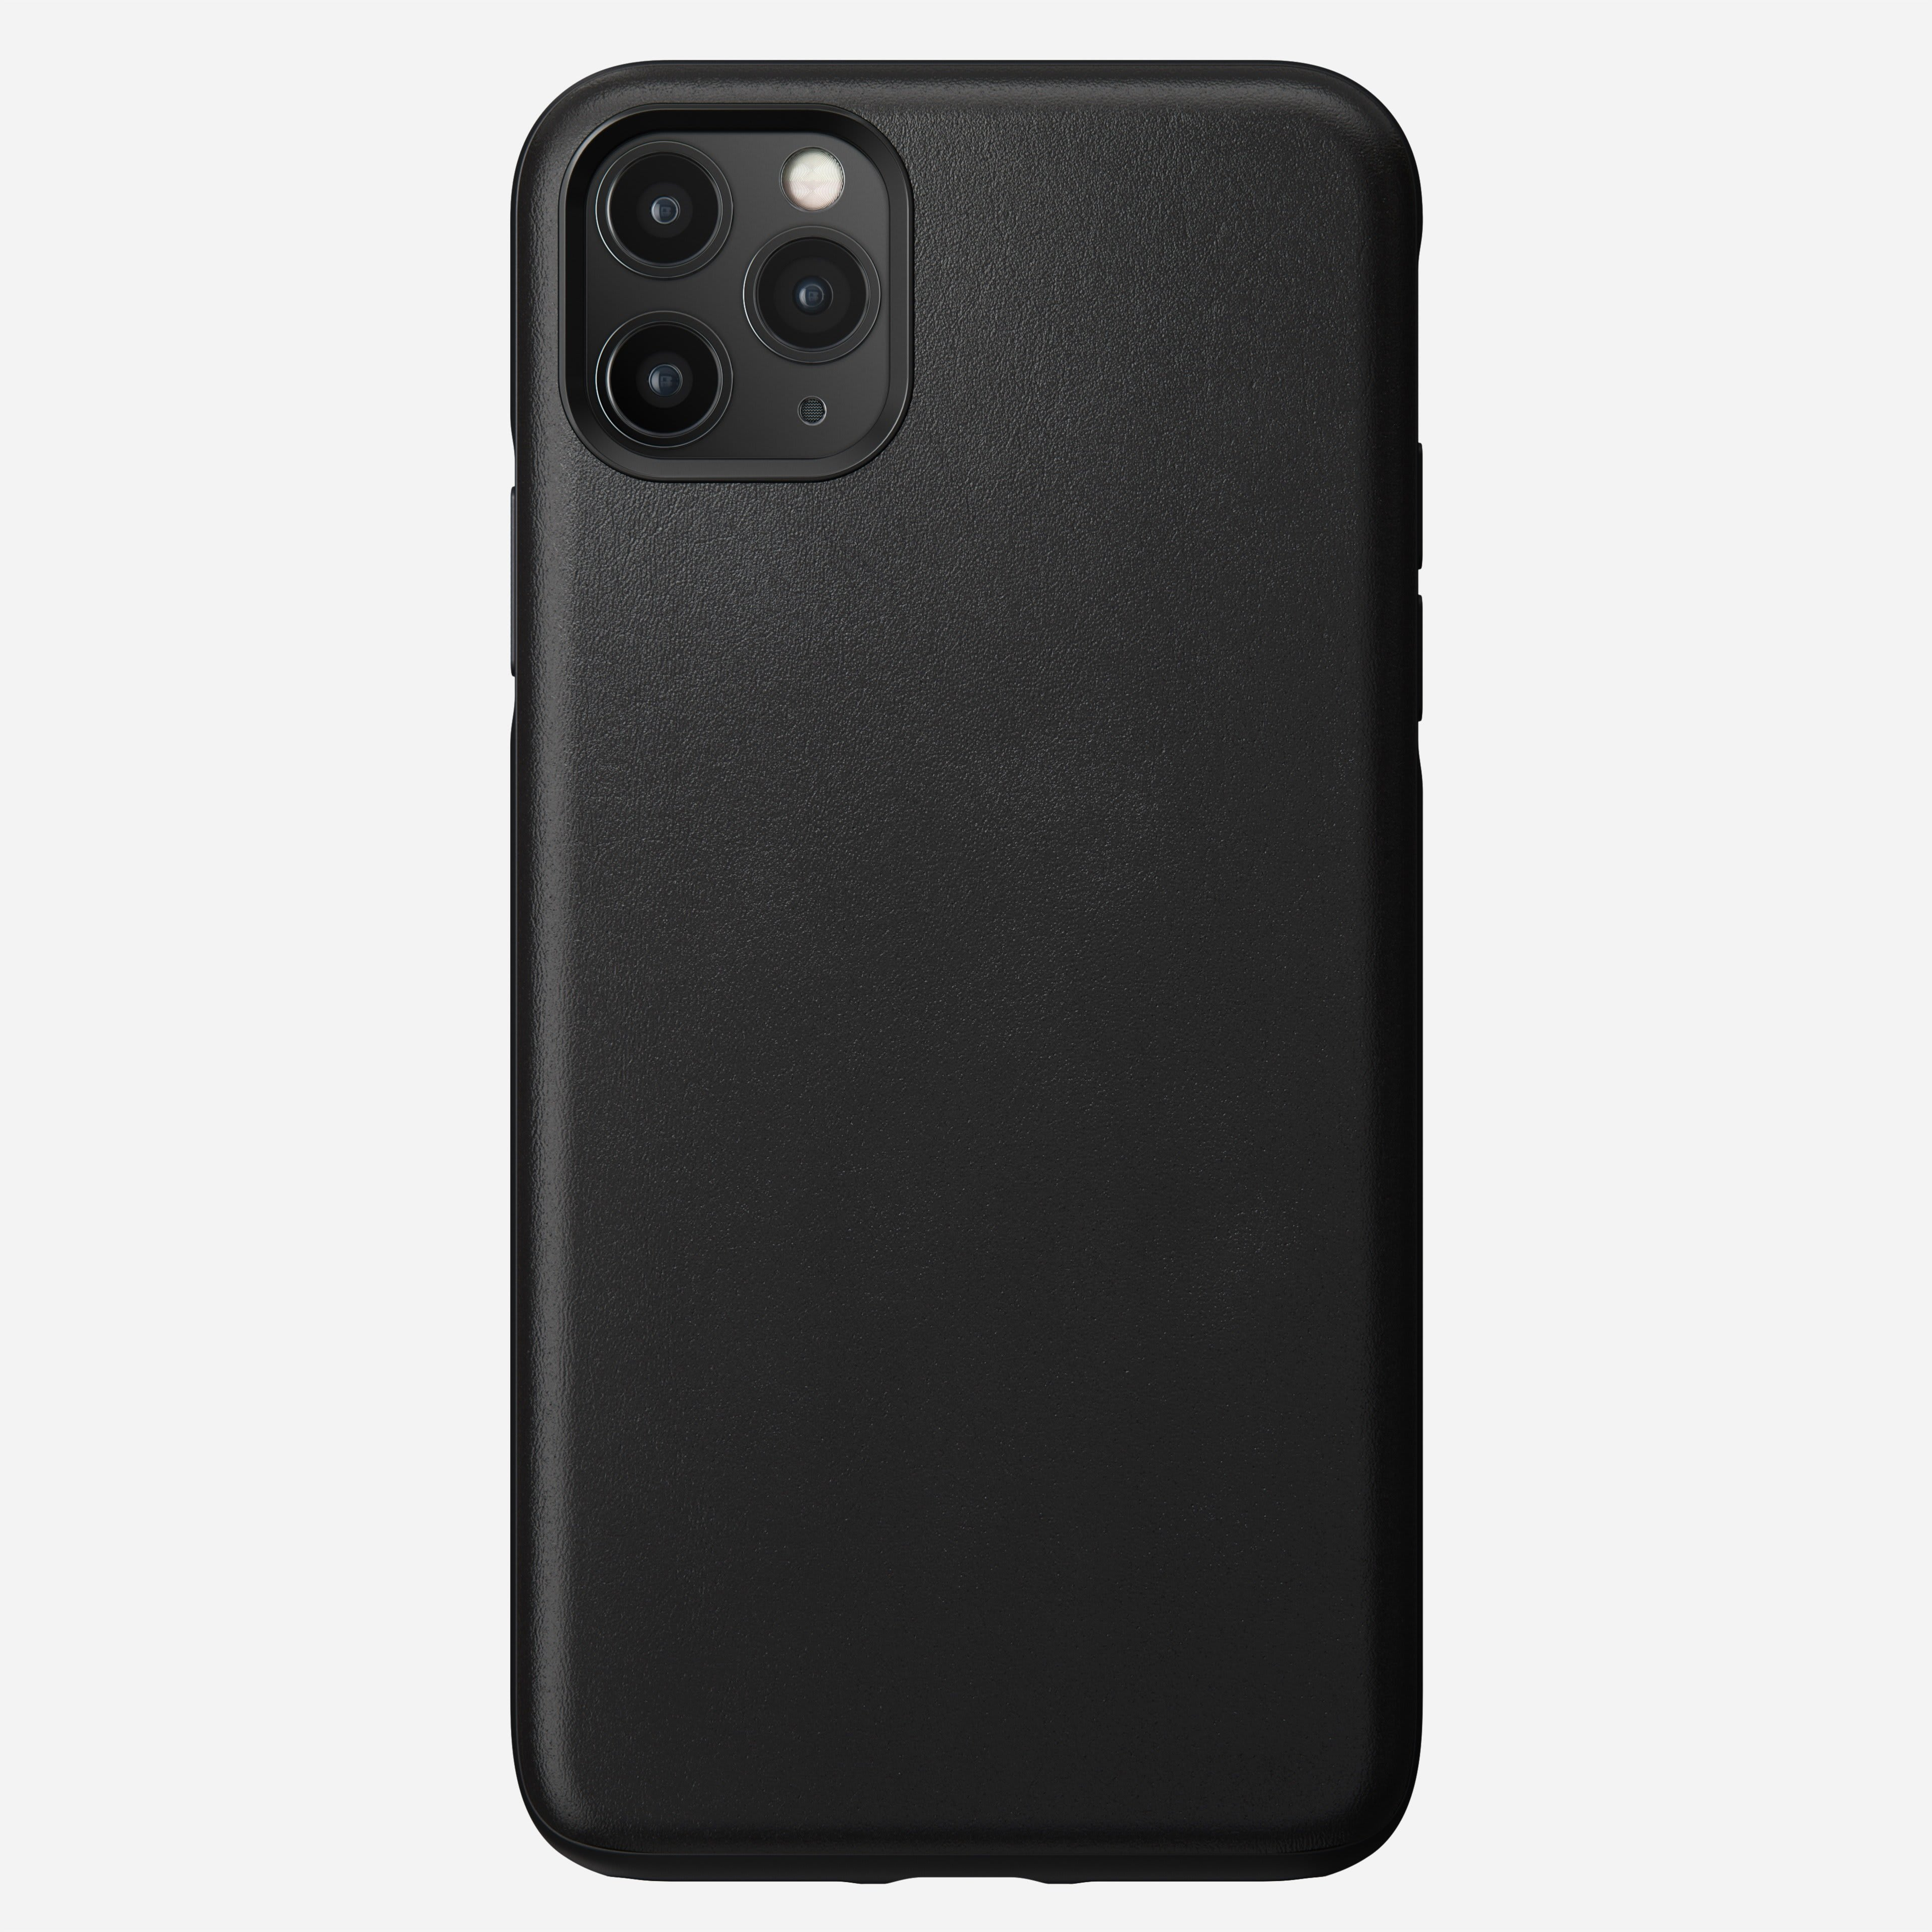 Rugged case black iphone 11 pro max